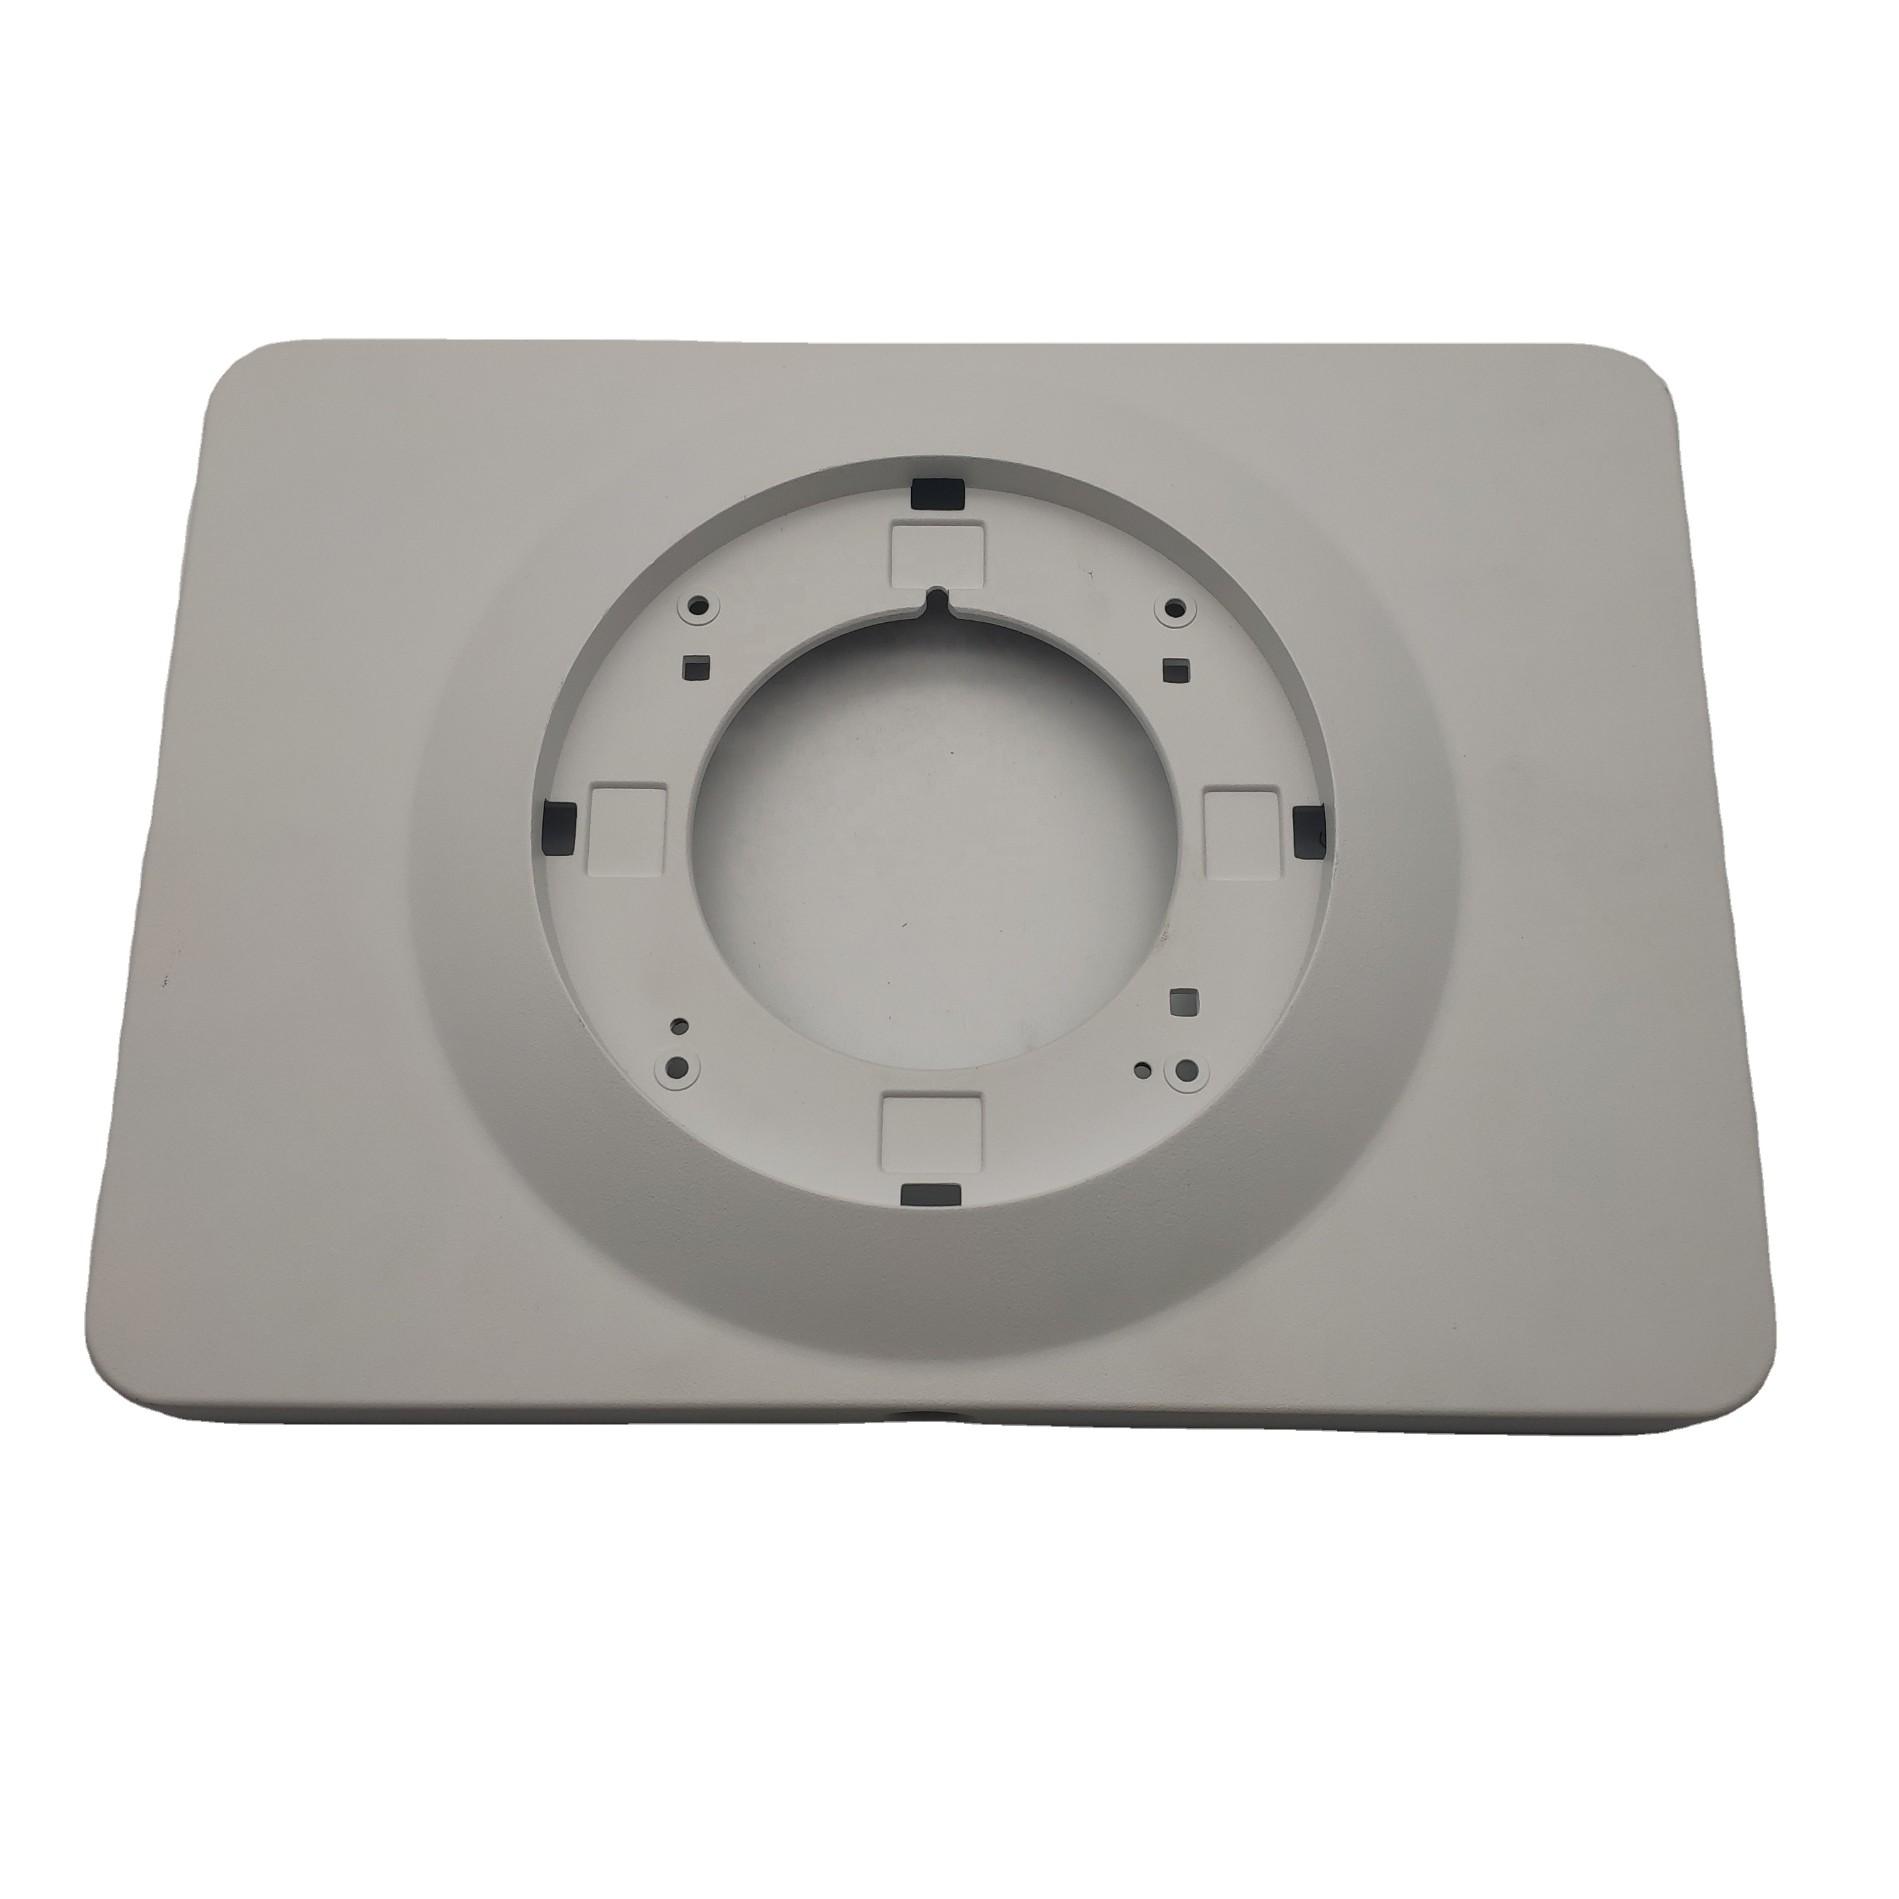 smart medical device Aluminum casting